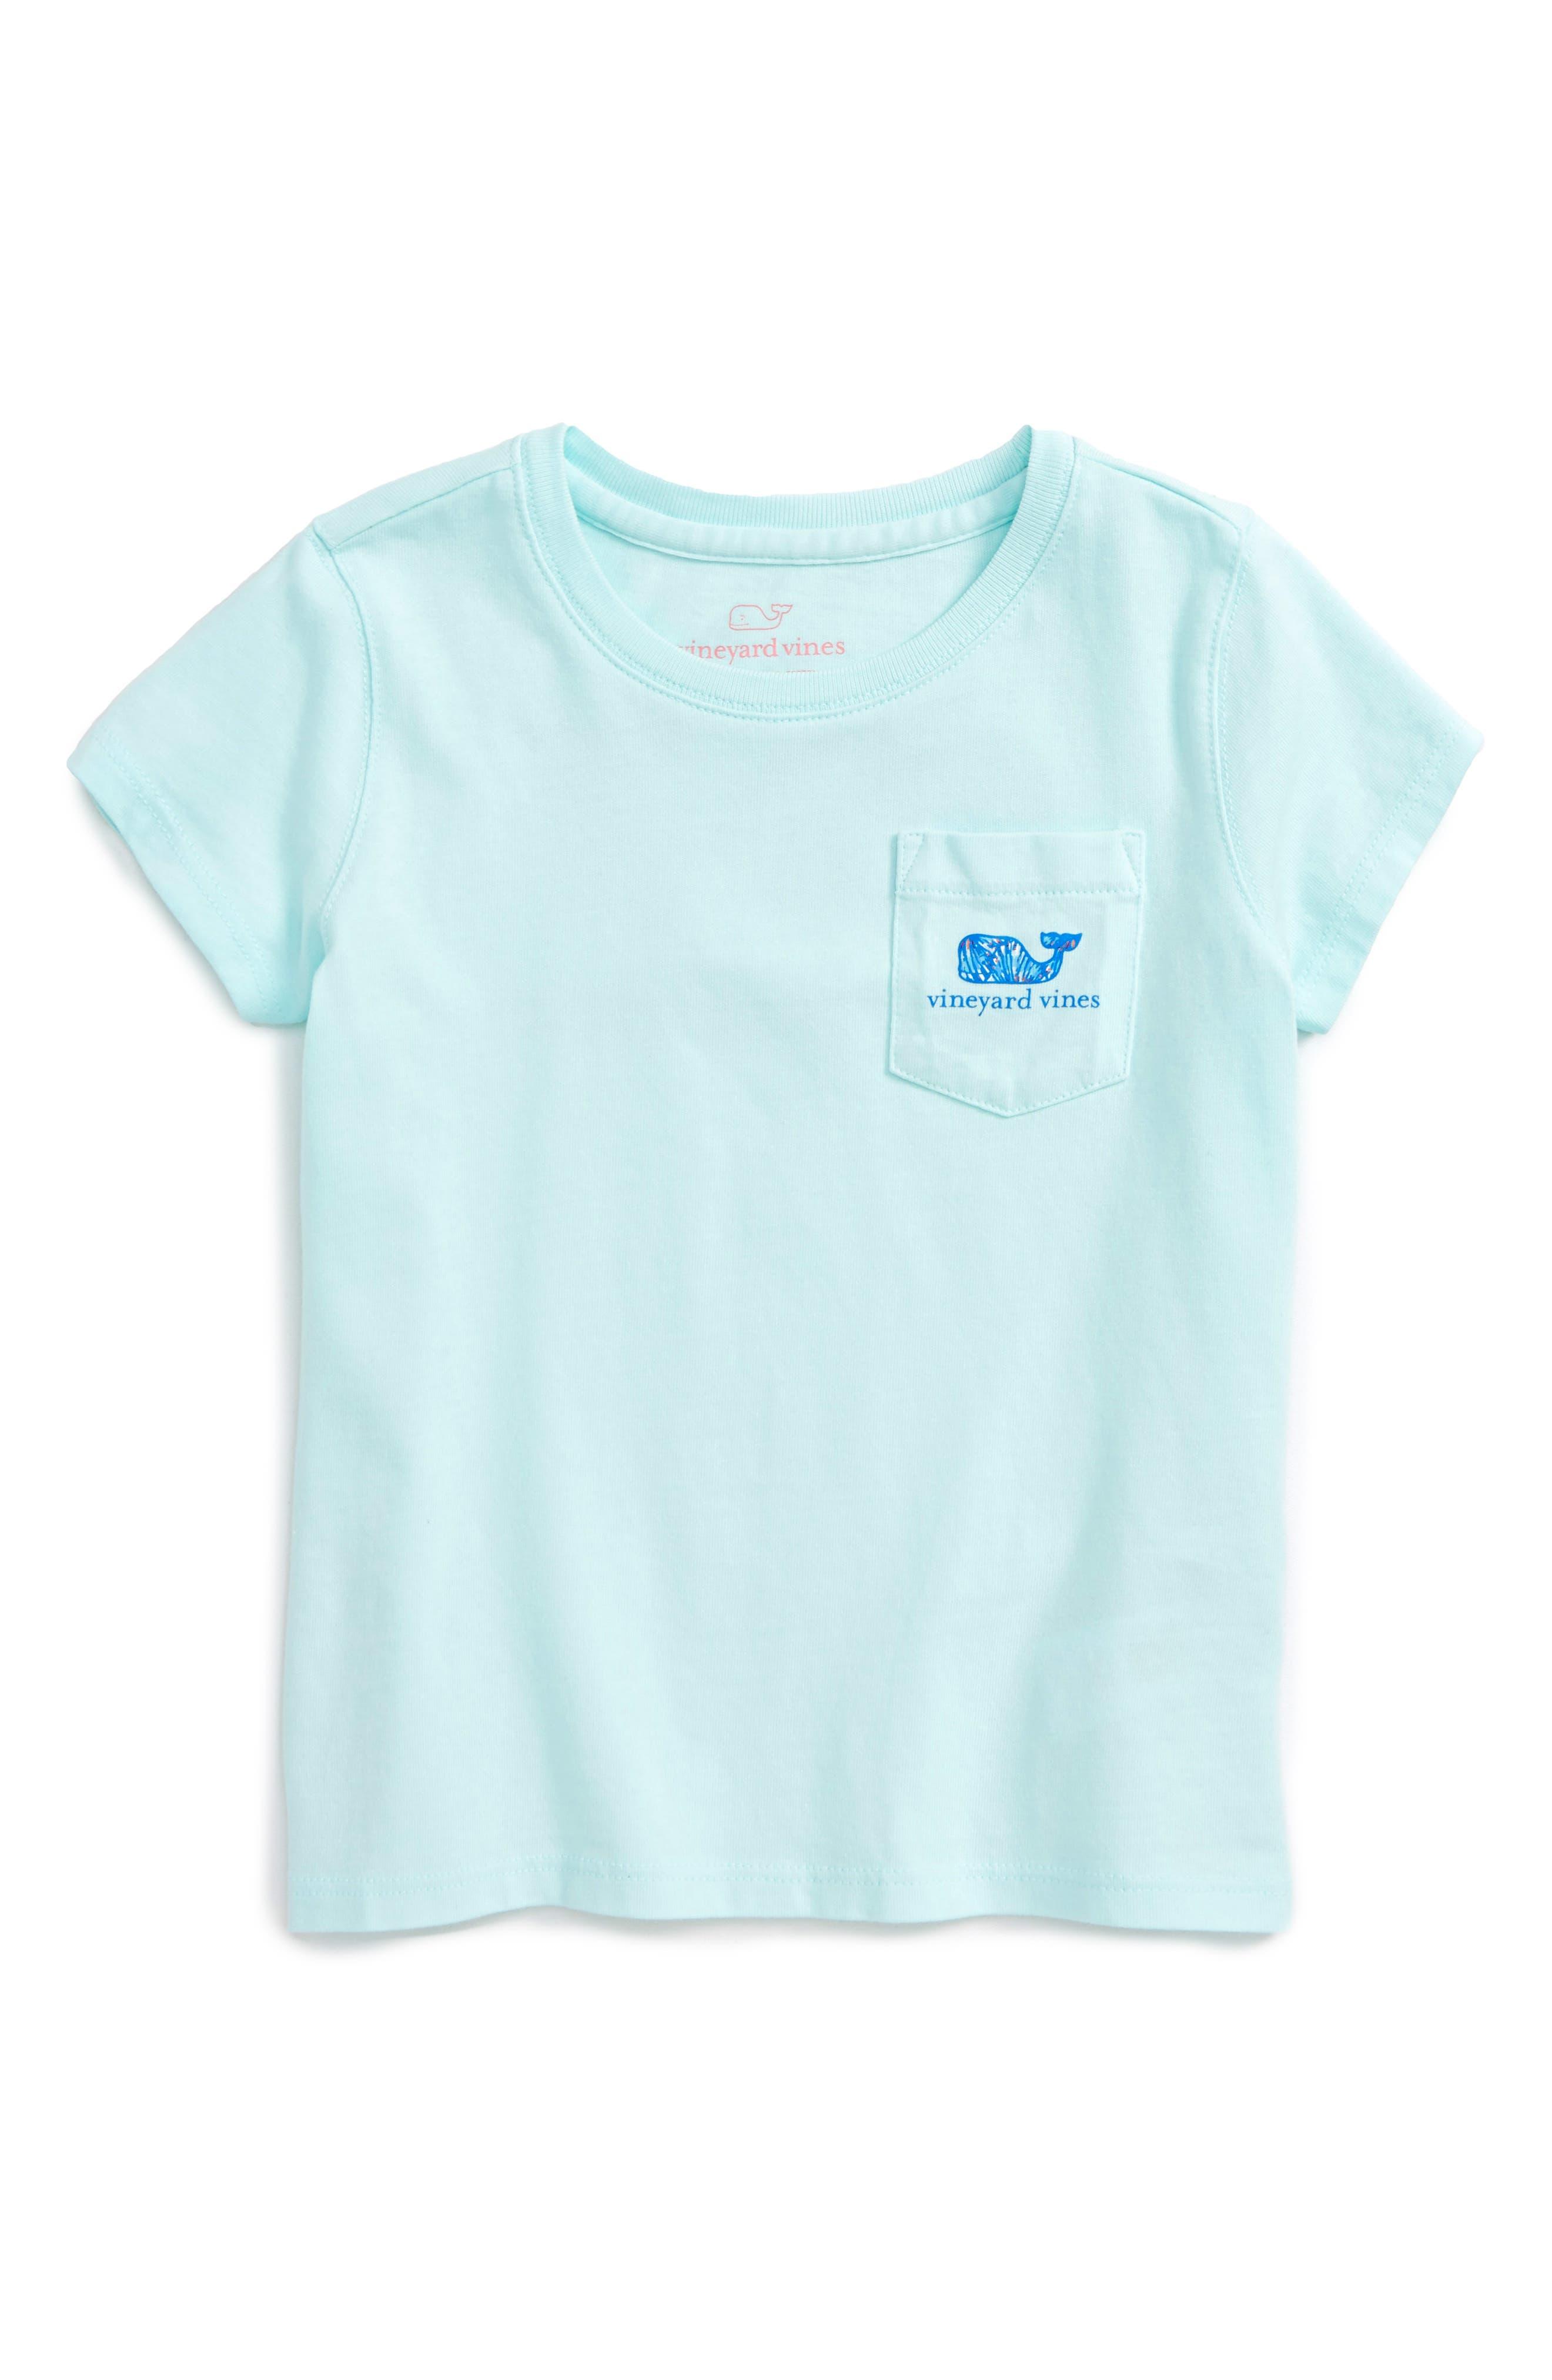 Vineyard Vines Shell Diamond Print Whale Tee (Toddler Girls)